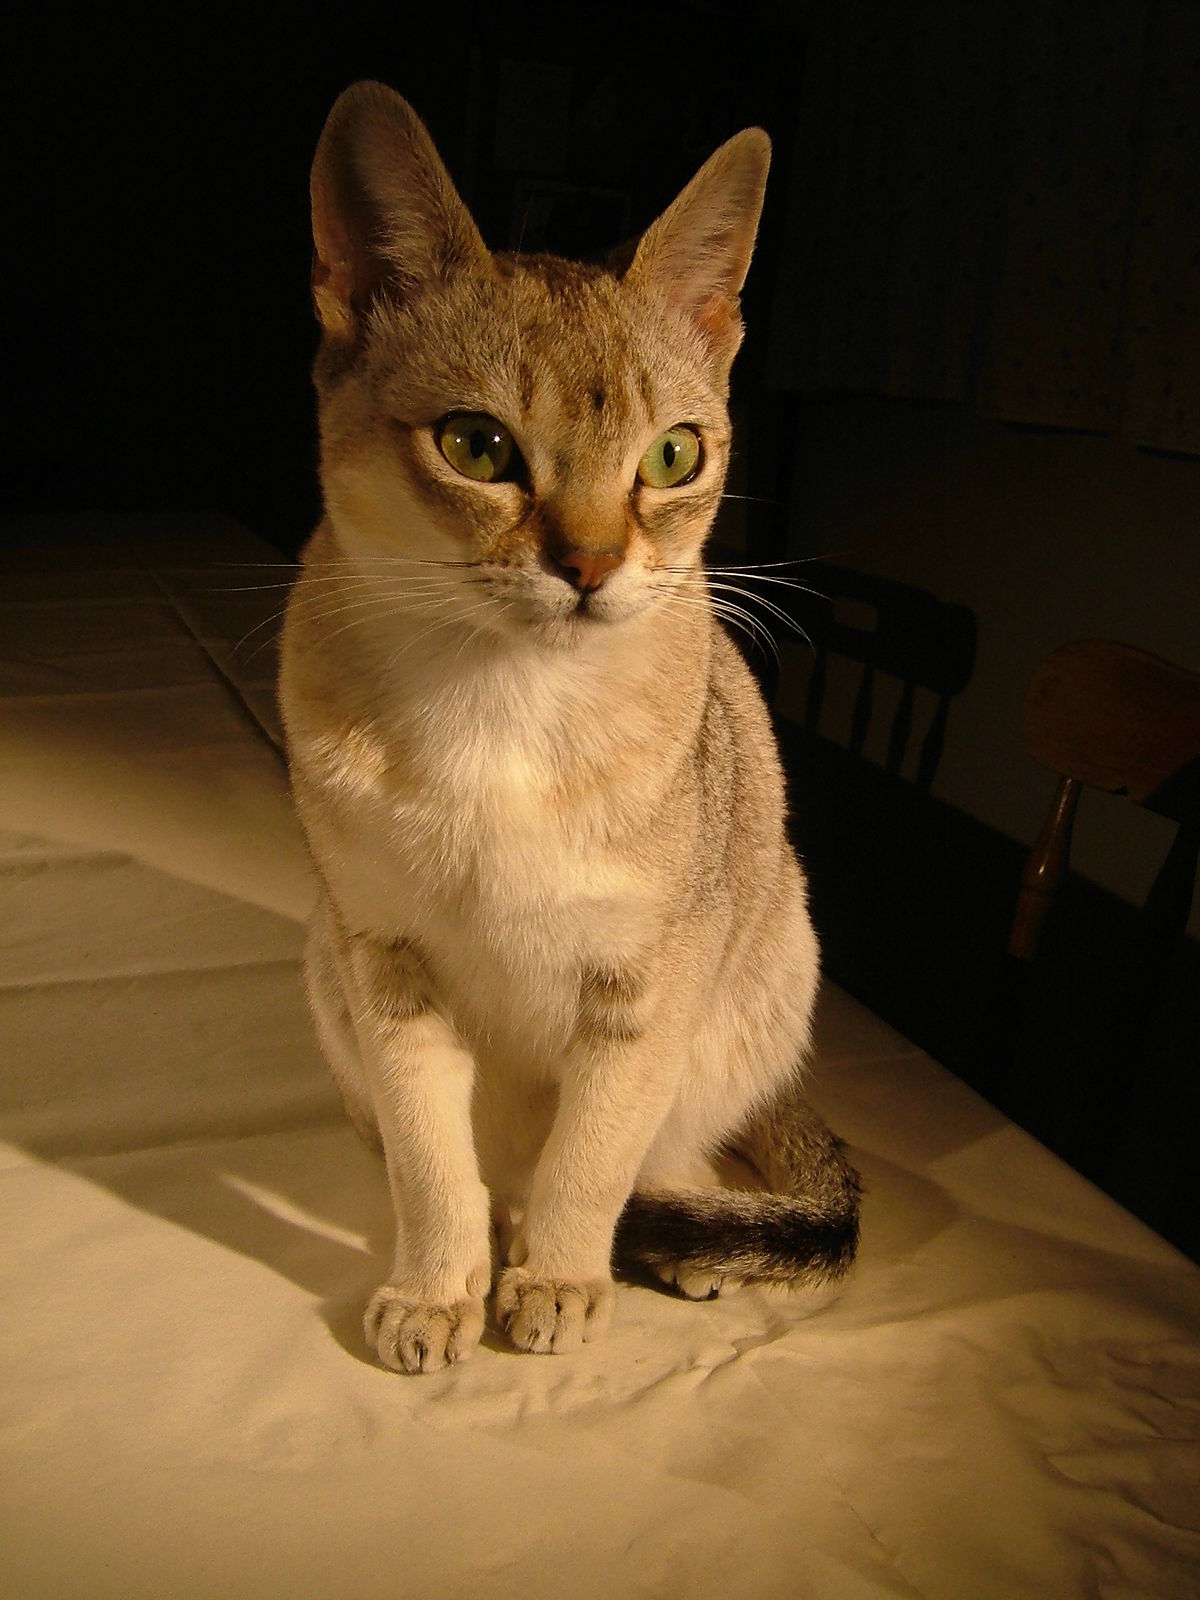 Singapura cat - Wikipedia